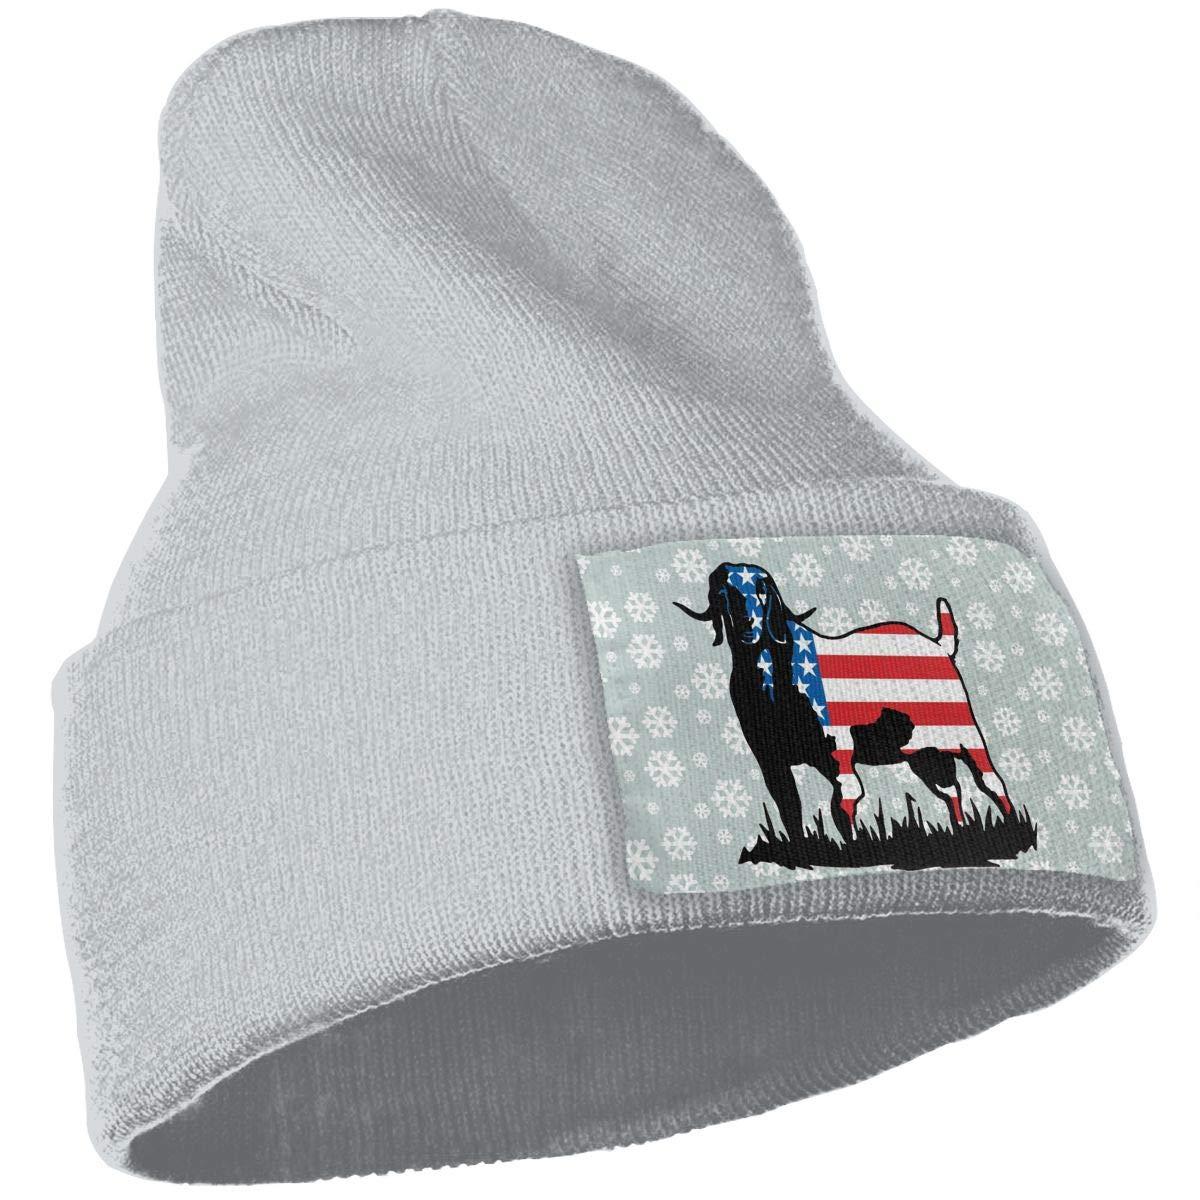 TAOMAP89 Colorrado Boer Goat Flag Men /& Women Skull Caps Winter Warm Stretchy Knitting Beanie Hats